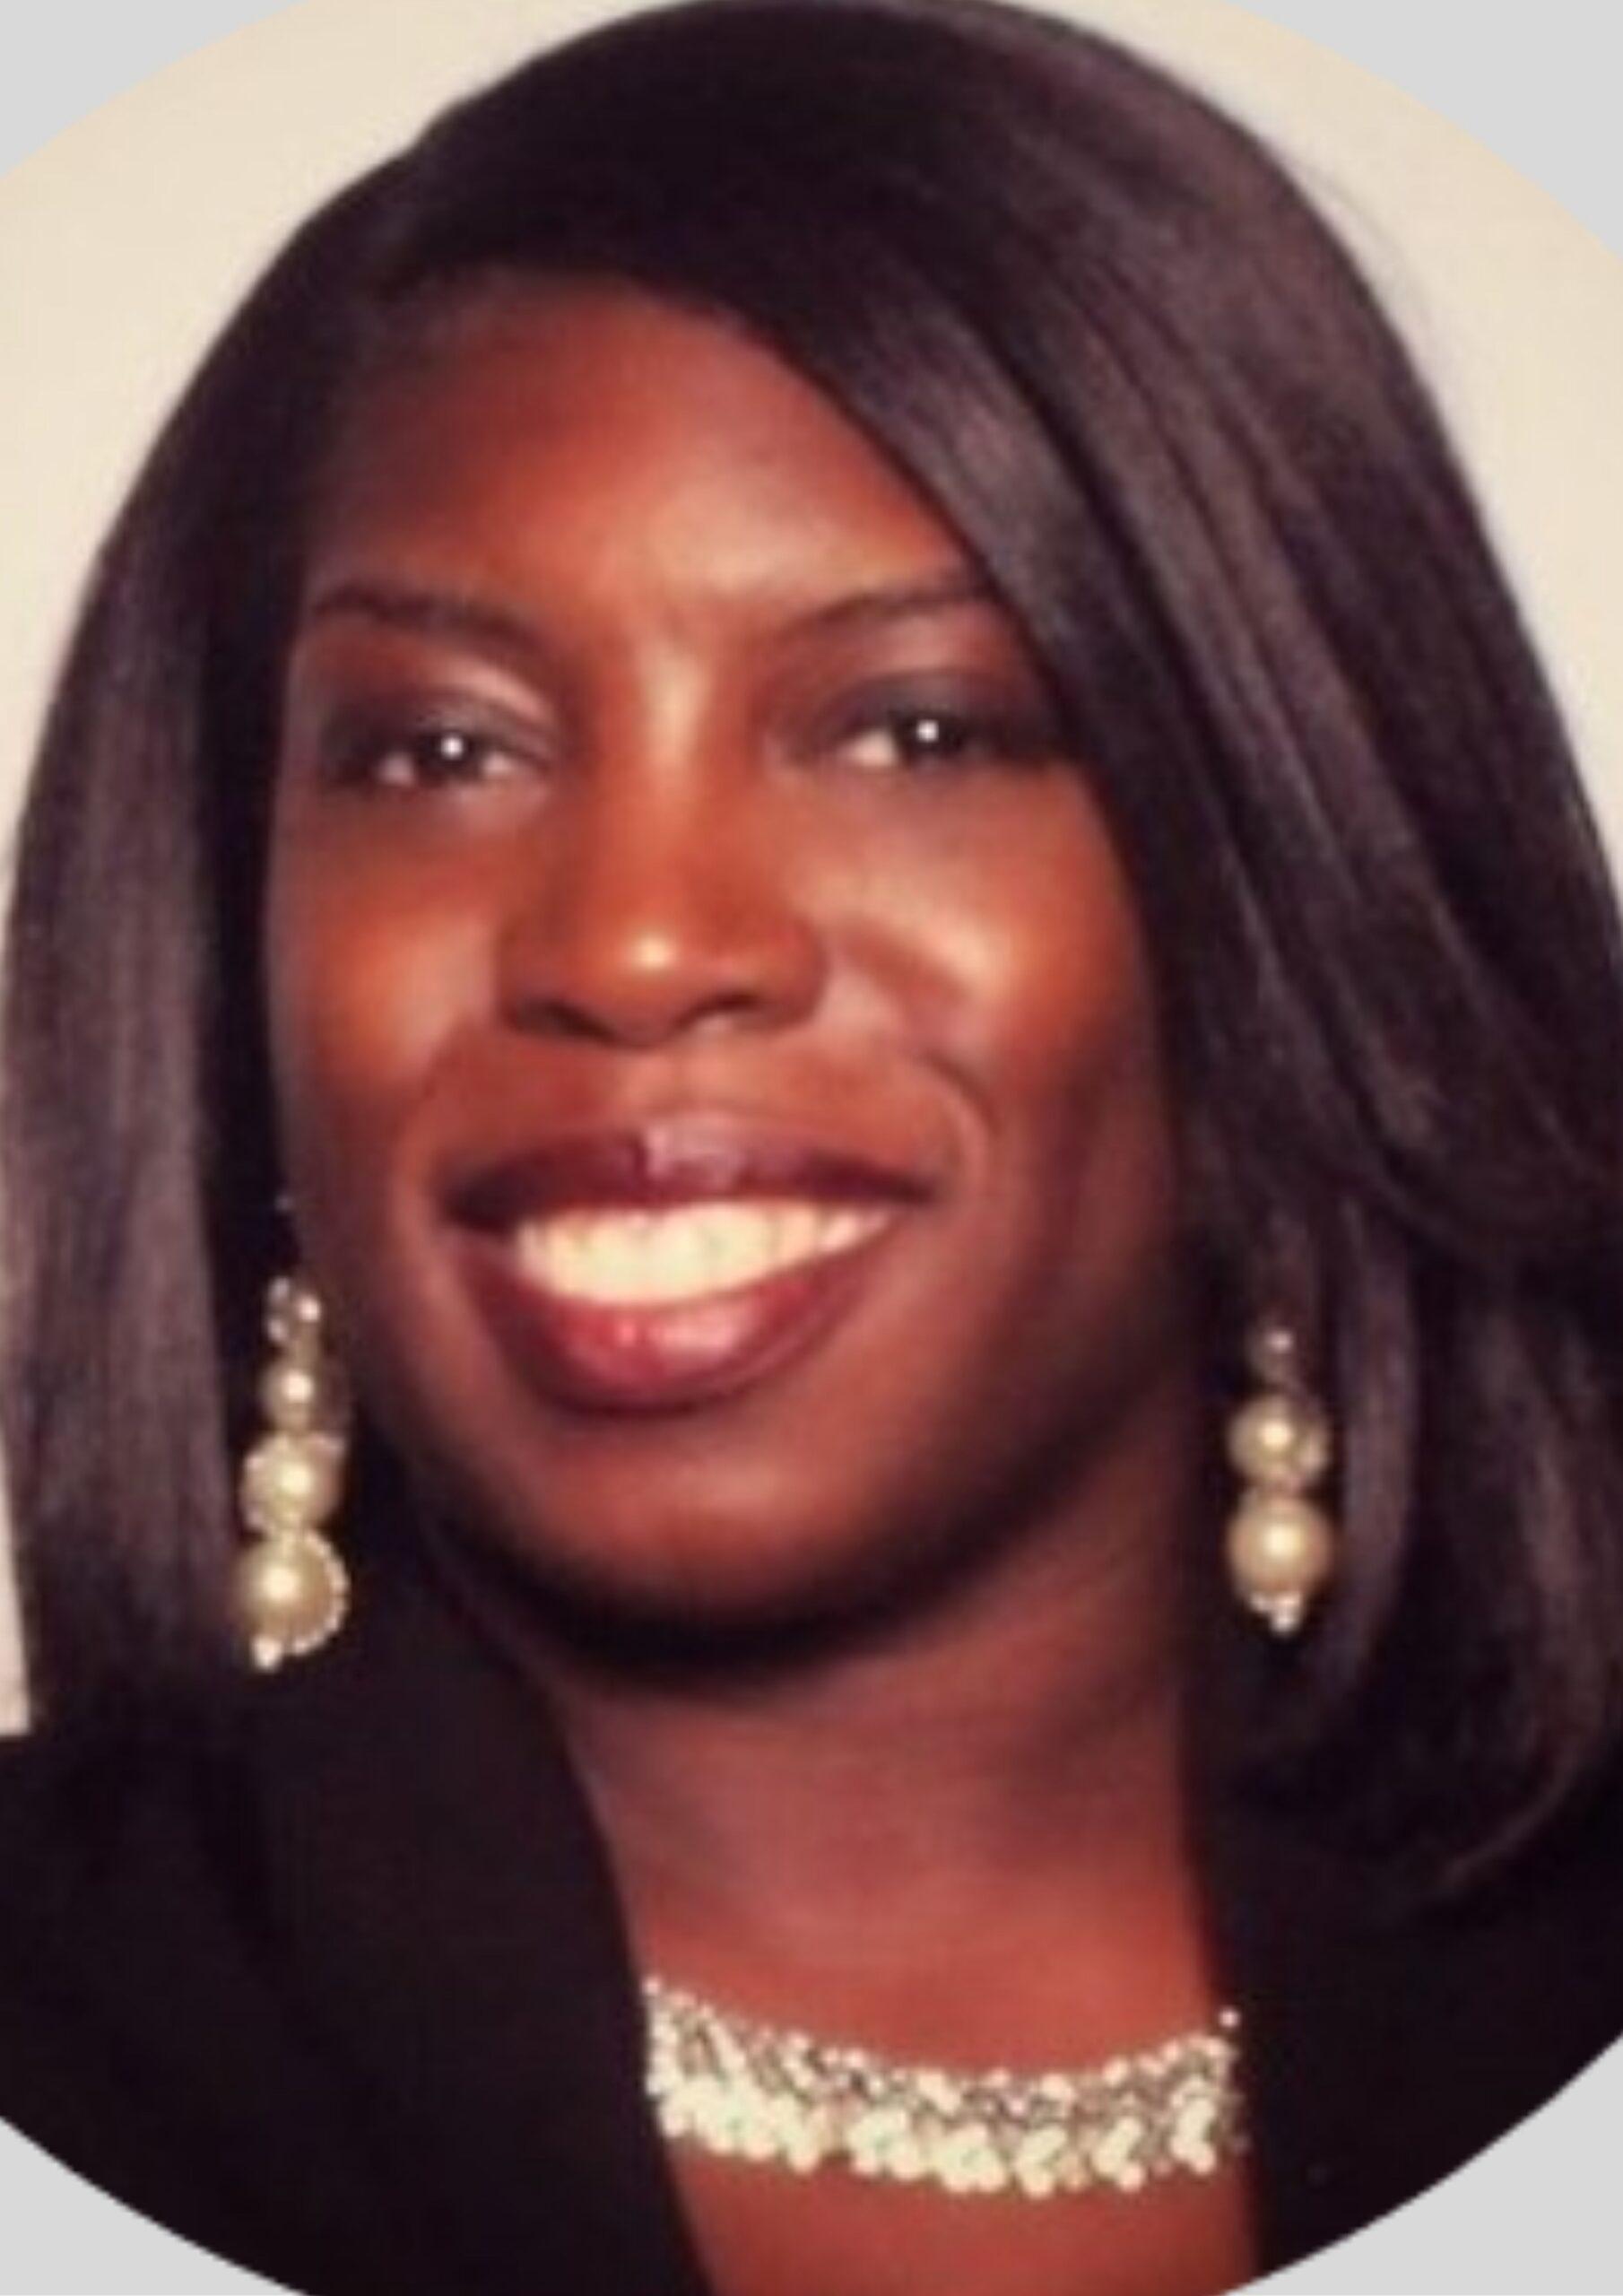 Ms. Geraldine Gooding